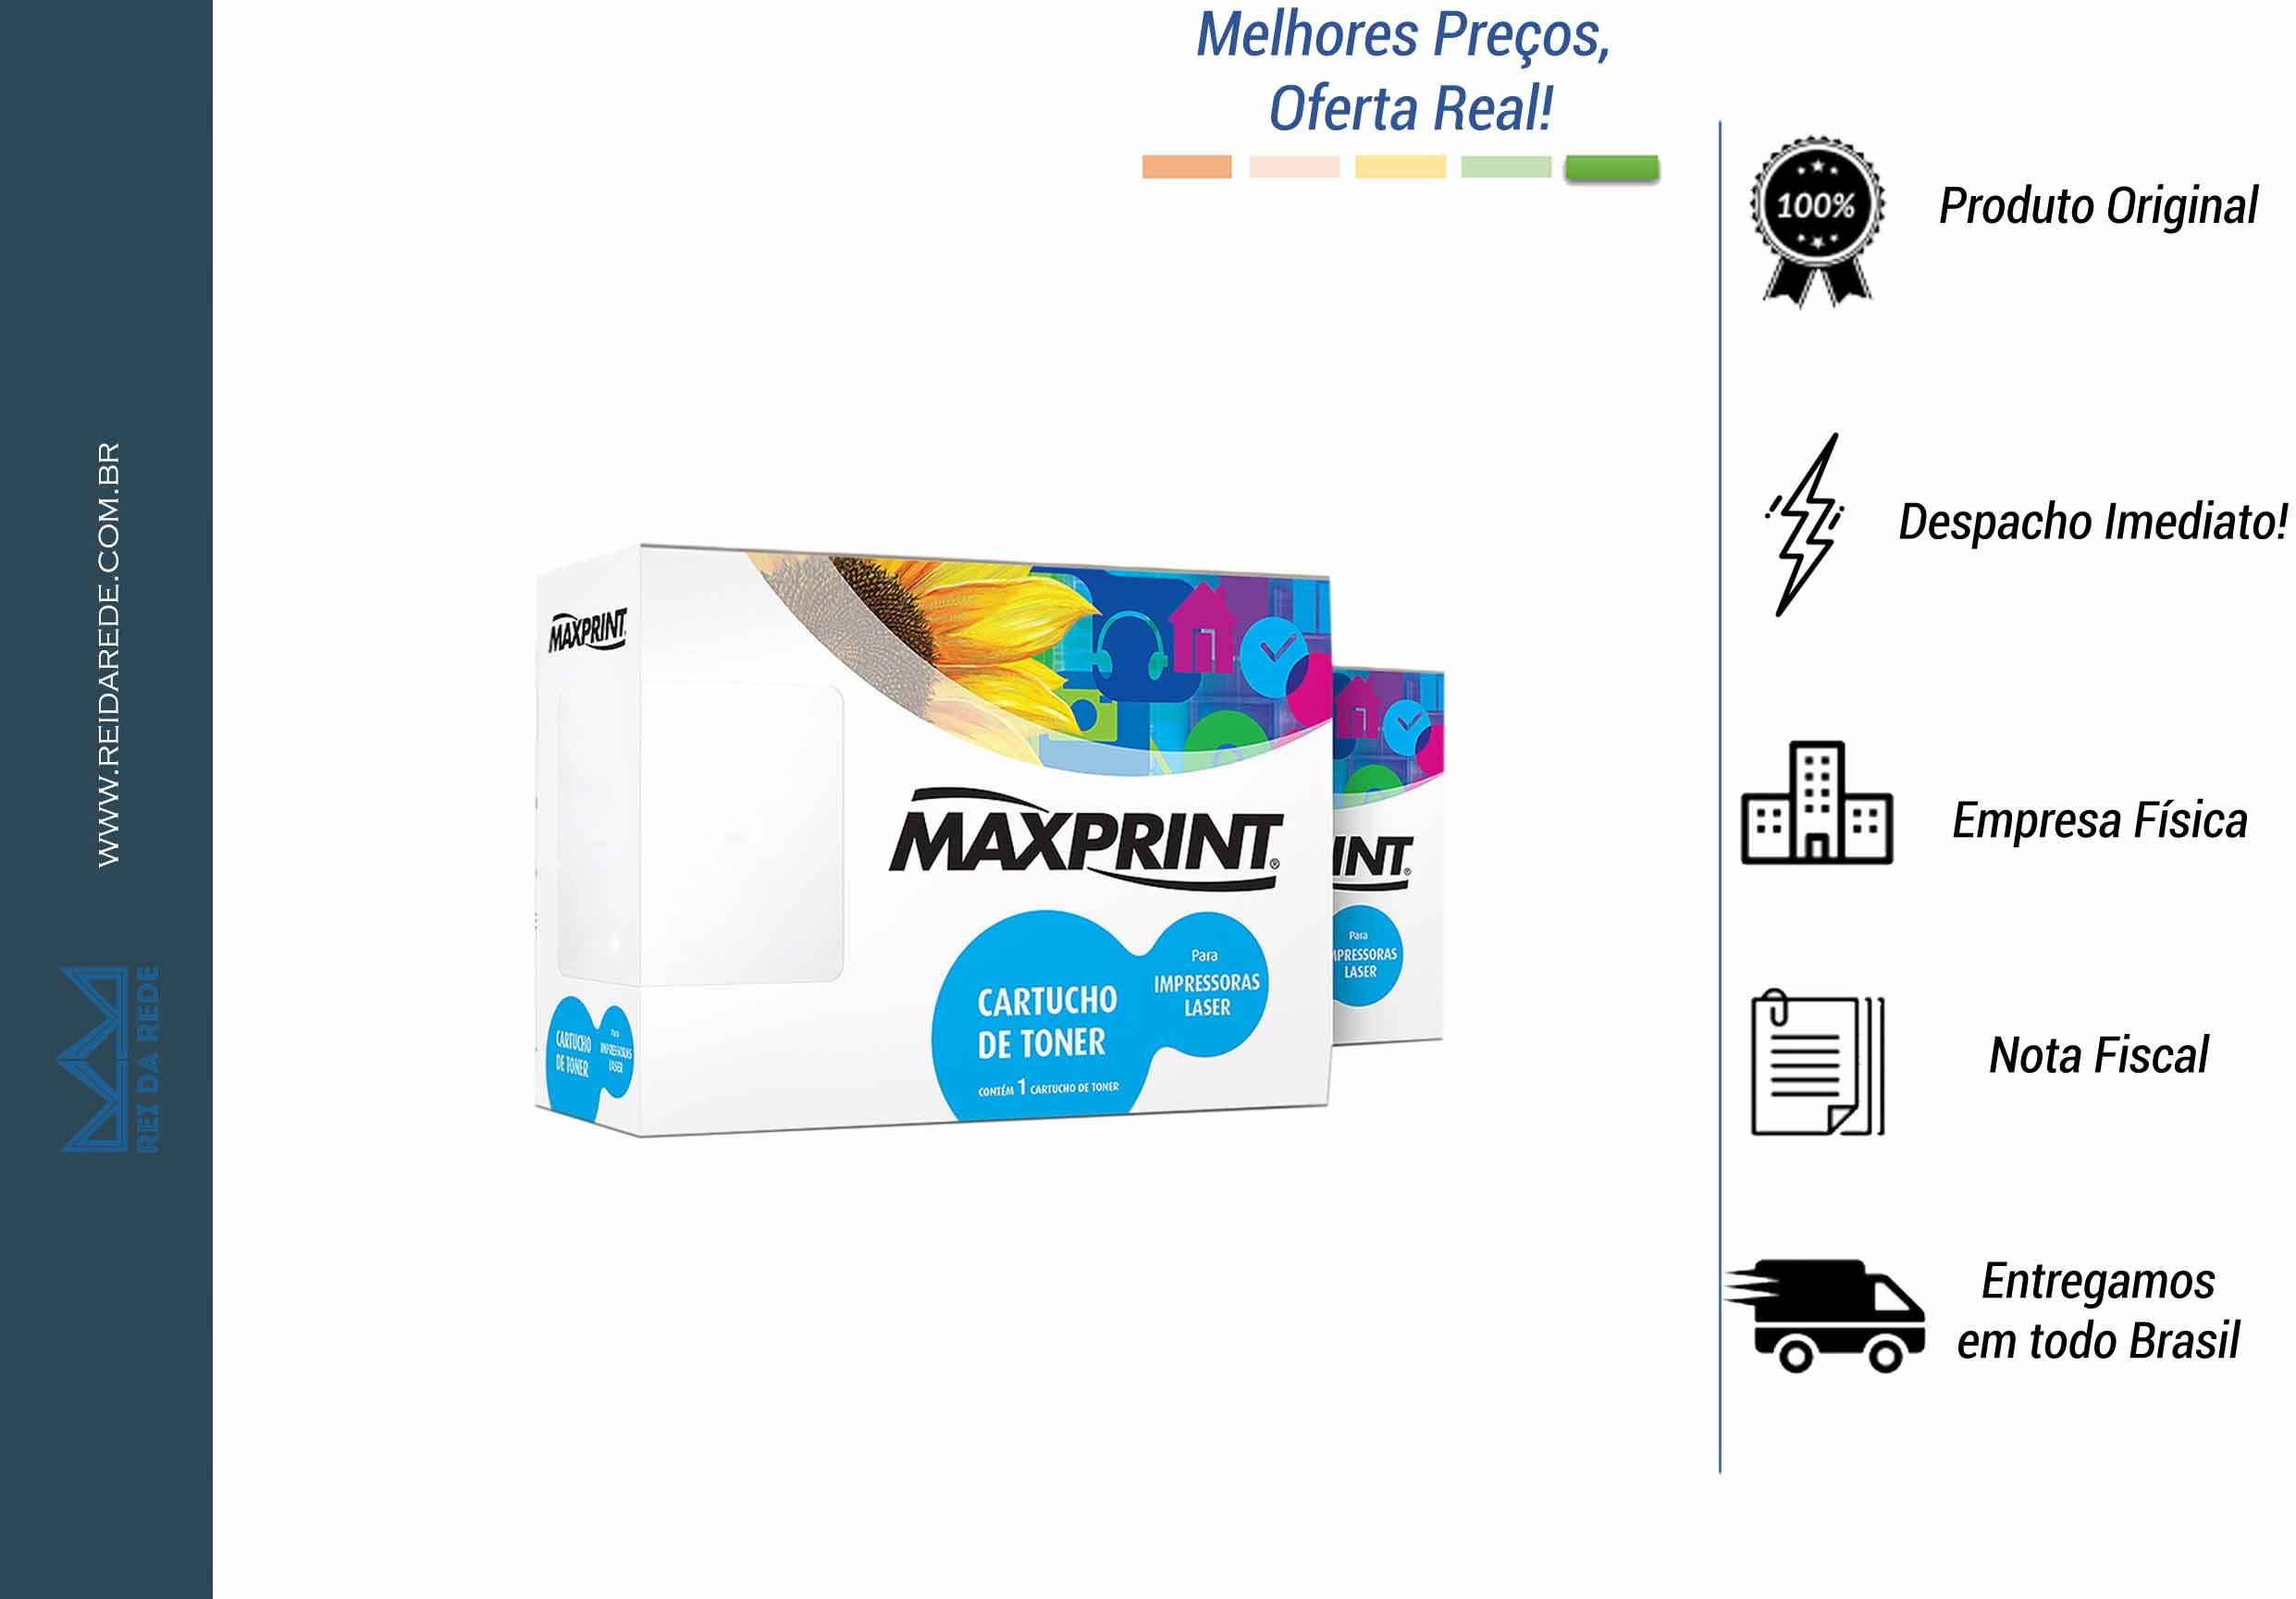 TONER HP LASERJET PRO 400 AMARELO CE412A (M451 NW - MFP M475DN) MAXPRINT 561411-3